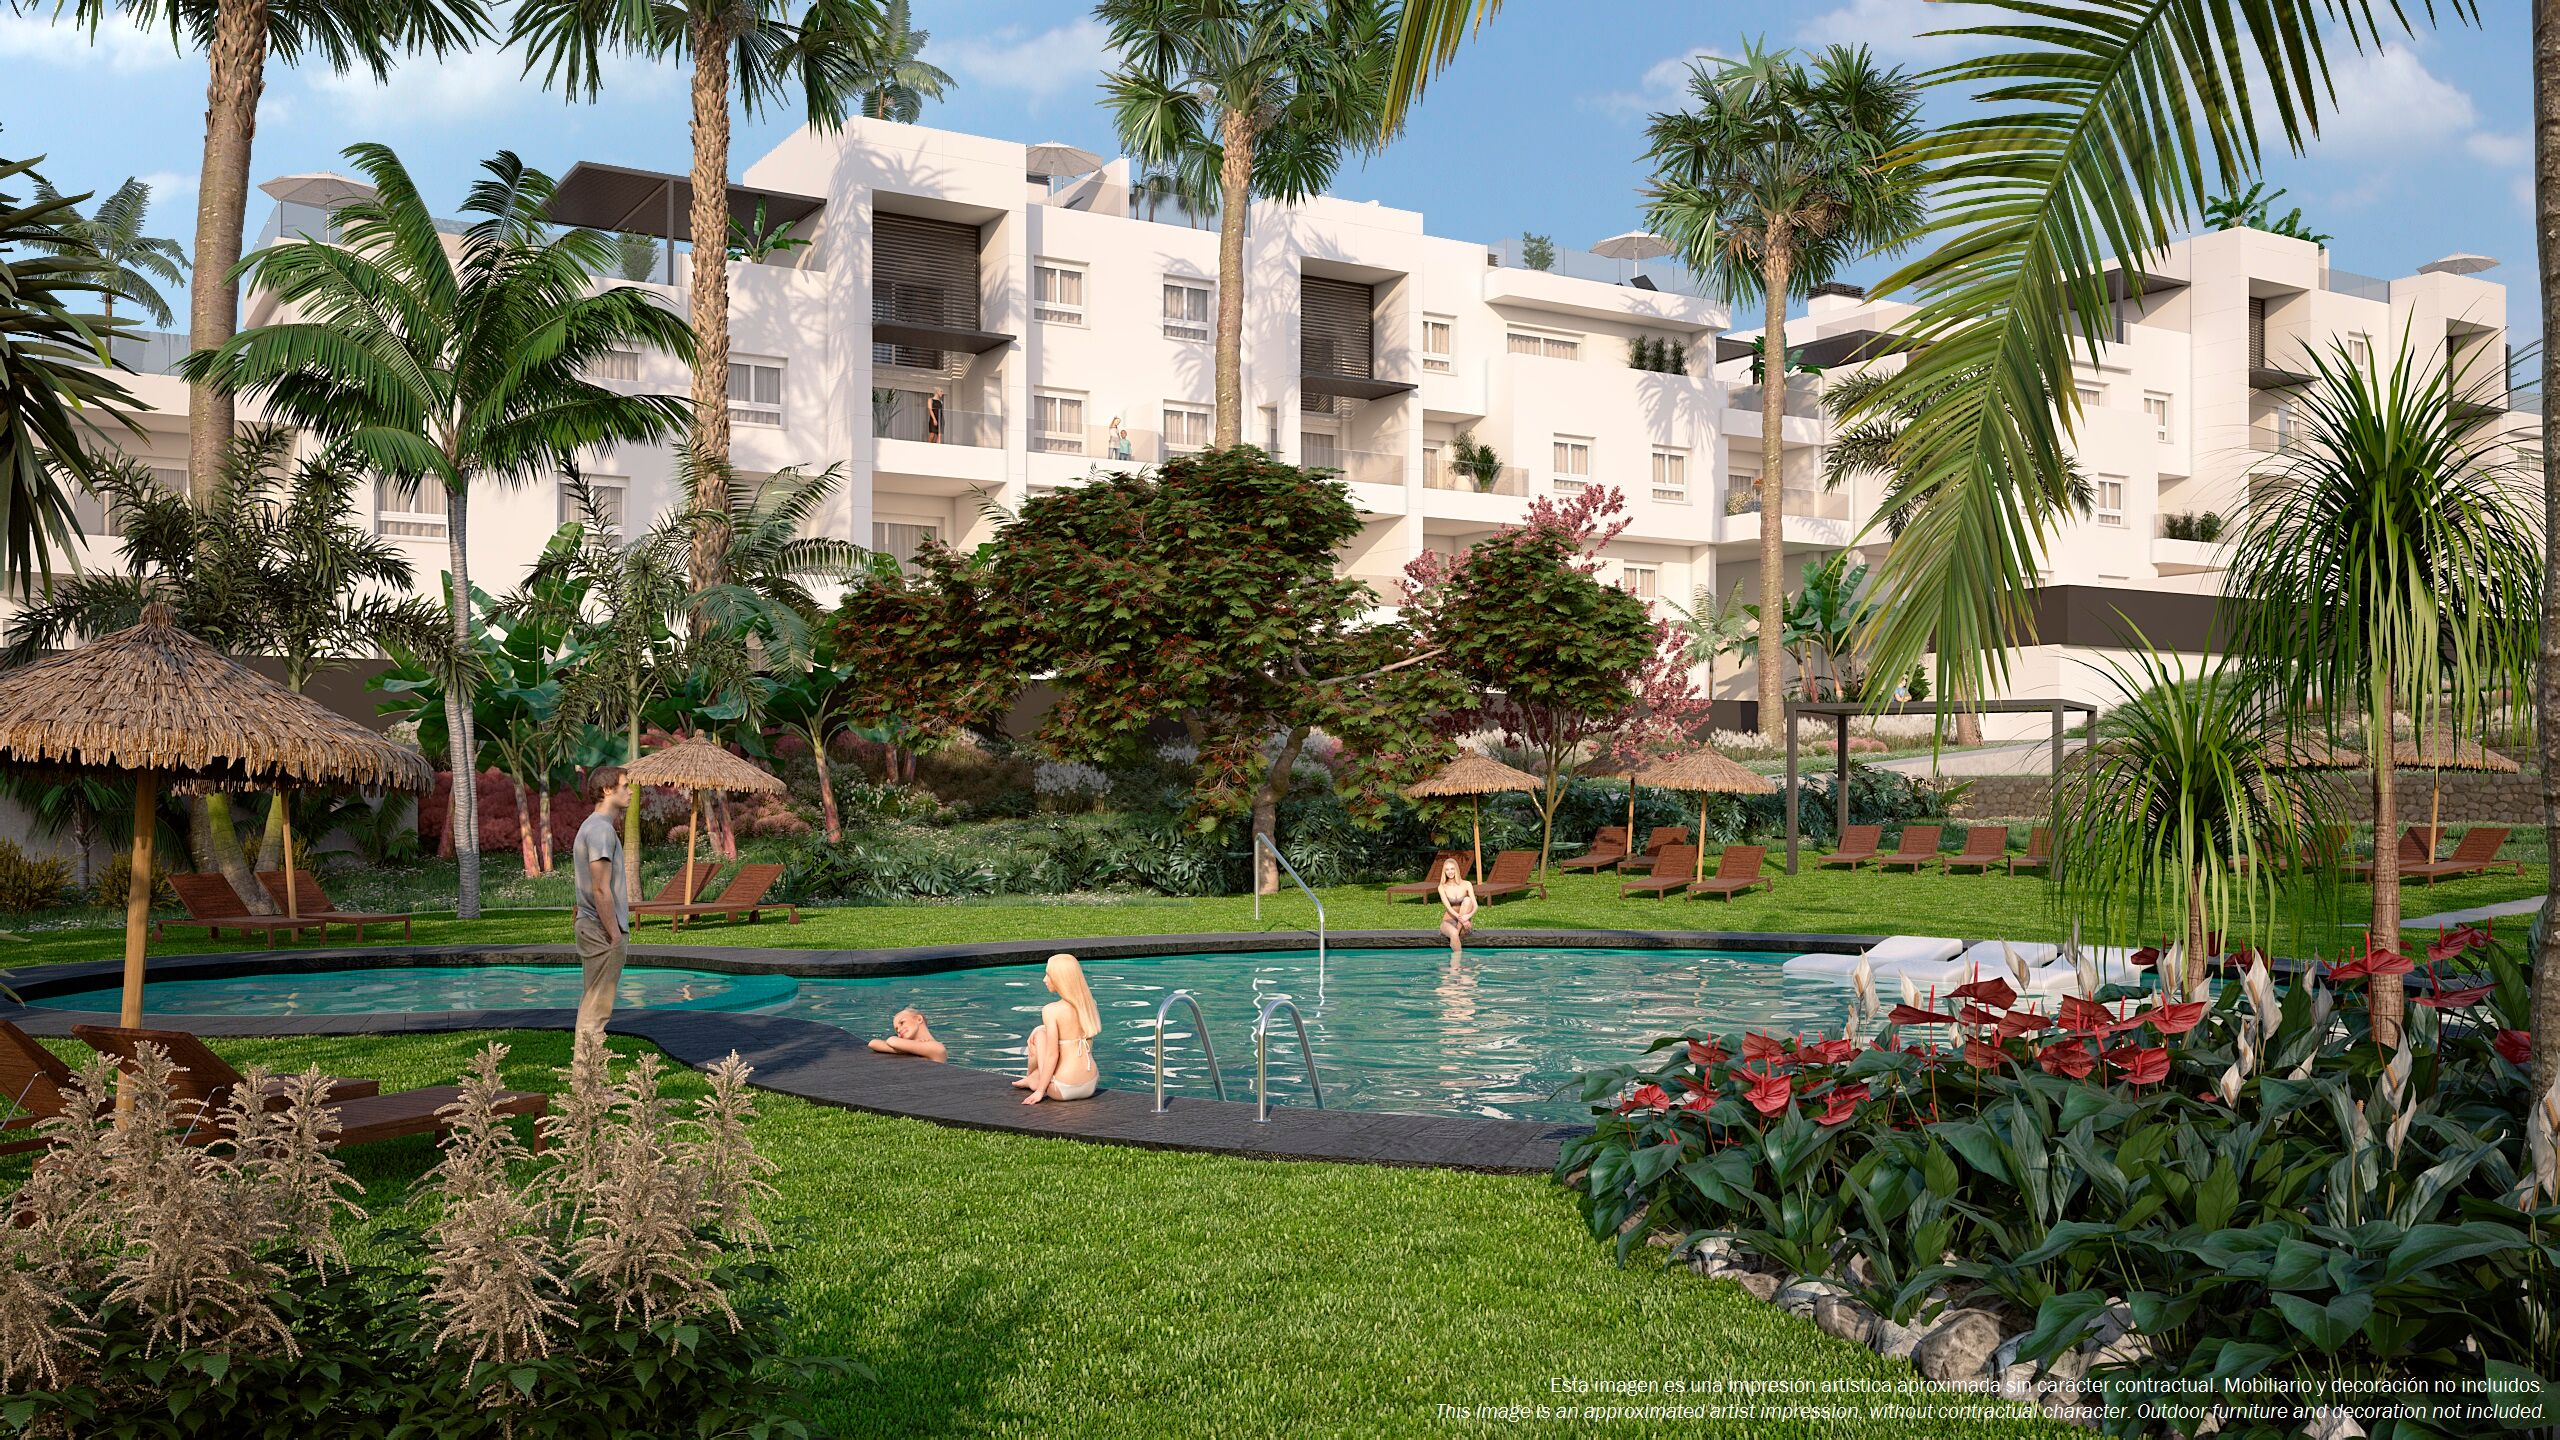 moderne appartementen Costa blanca Zuid, punta Prima Spanje